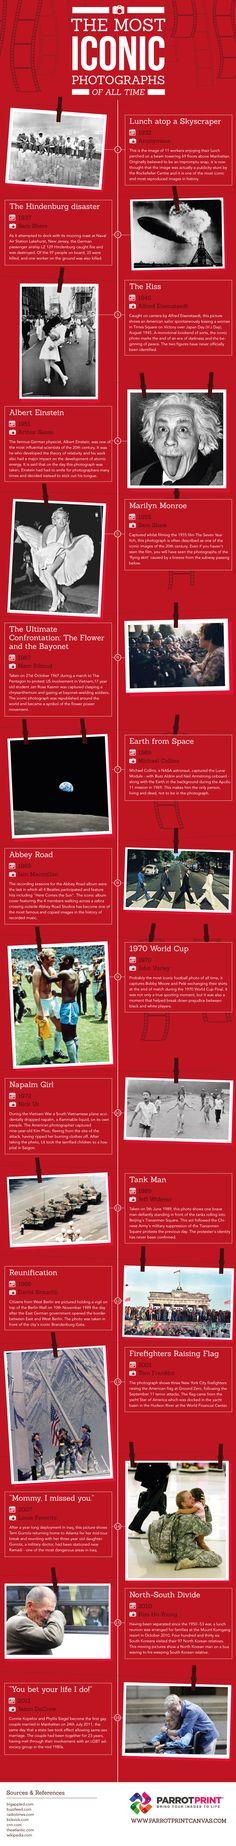 historic memorable photos